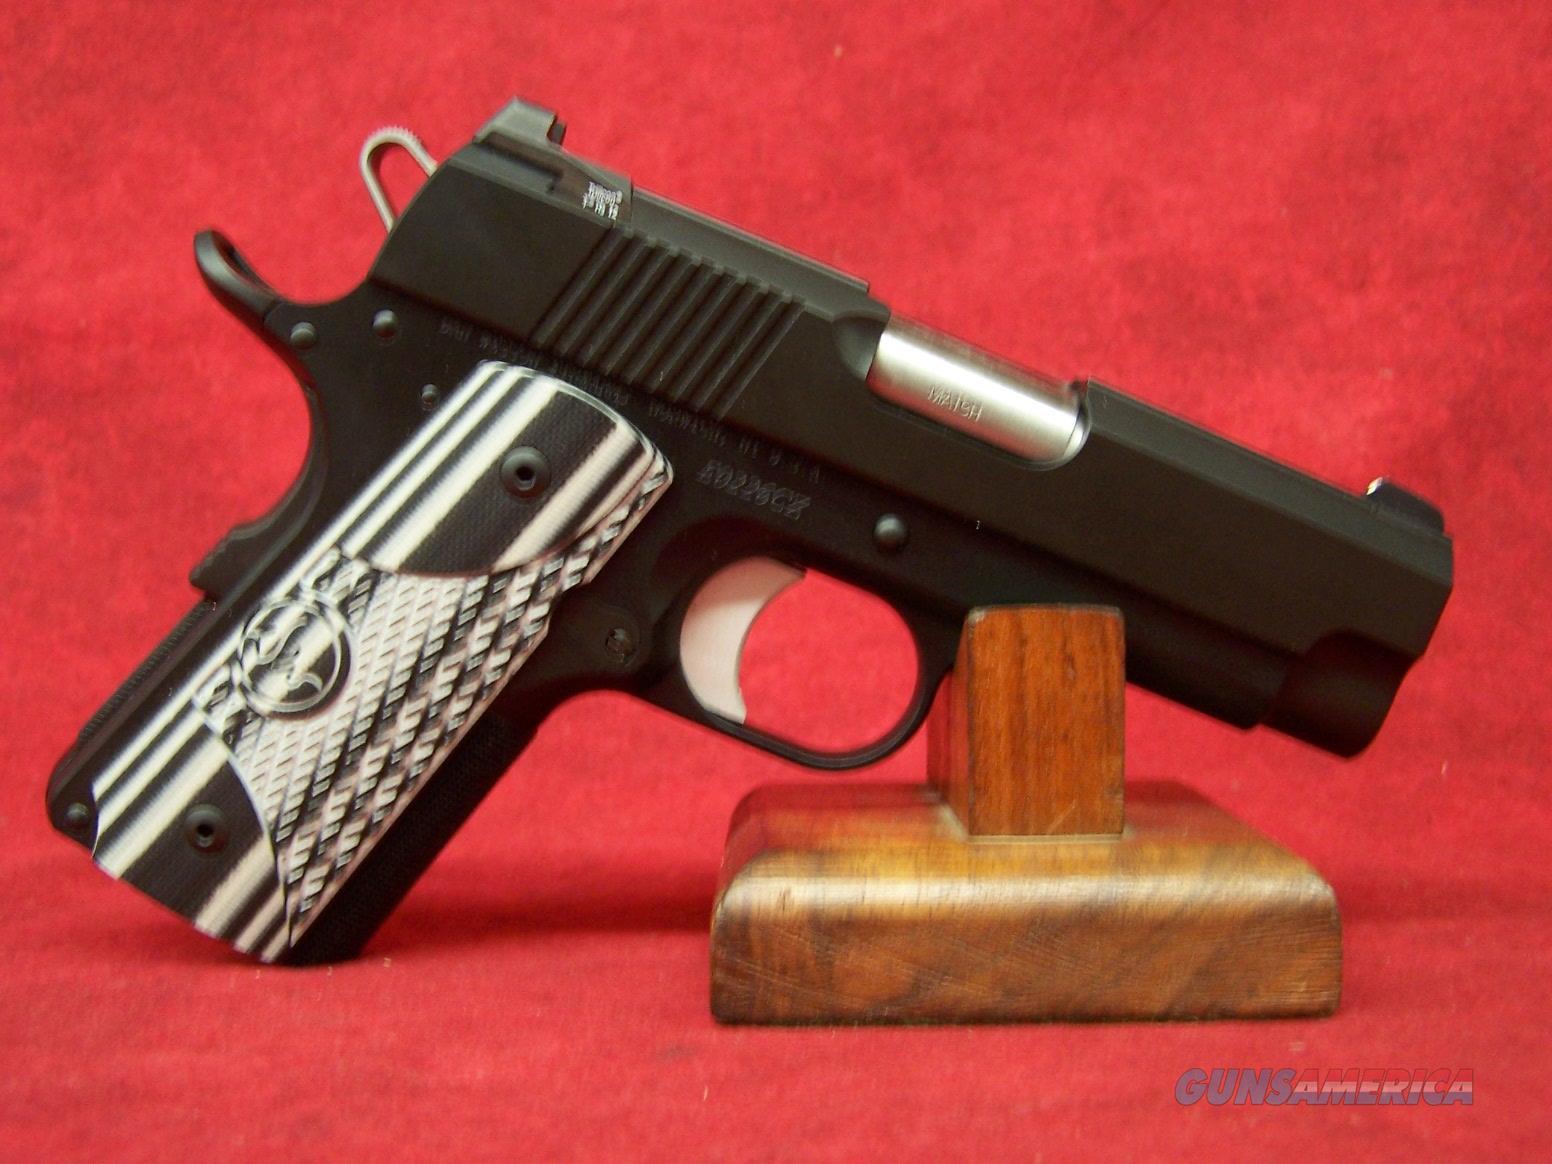 "Dan Wesson ECO Officer Size .45 ACP 3.5"" Barrel G10 ALLOY NS (01969) CZ USA  Guns > Pistols > Dan Wesson Pistols/Revolvers > 1911 Style"